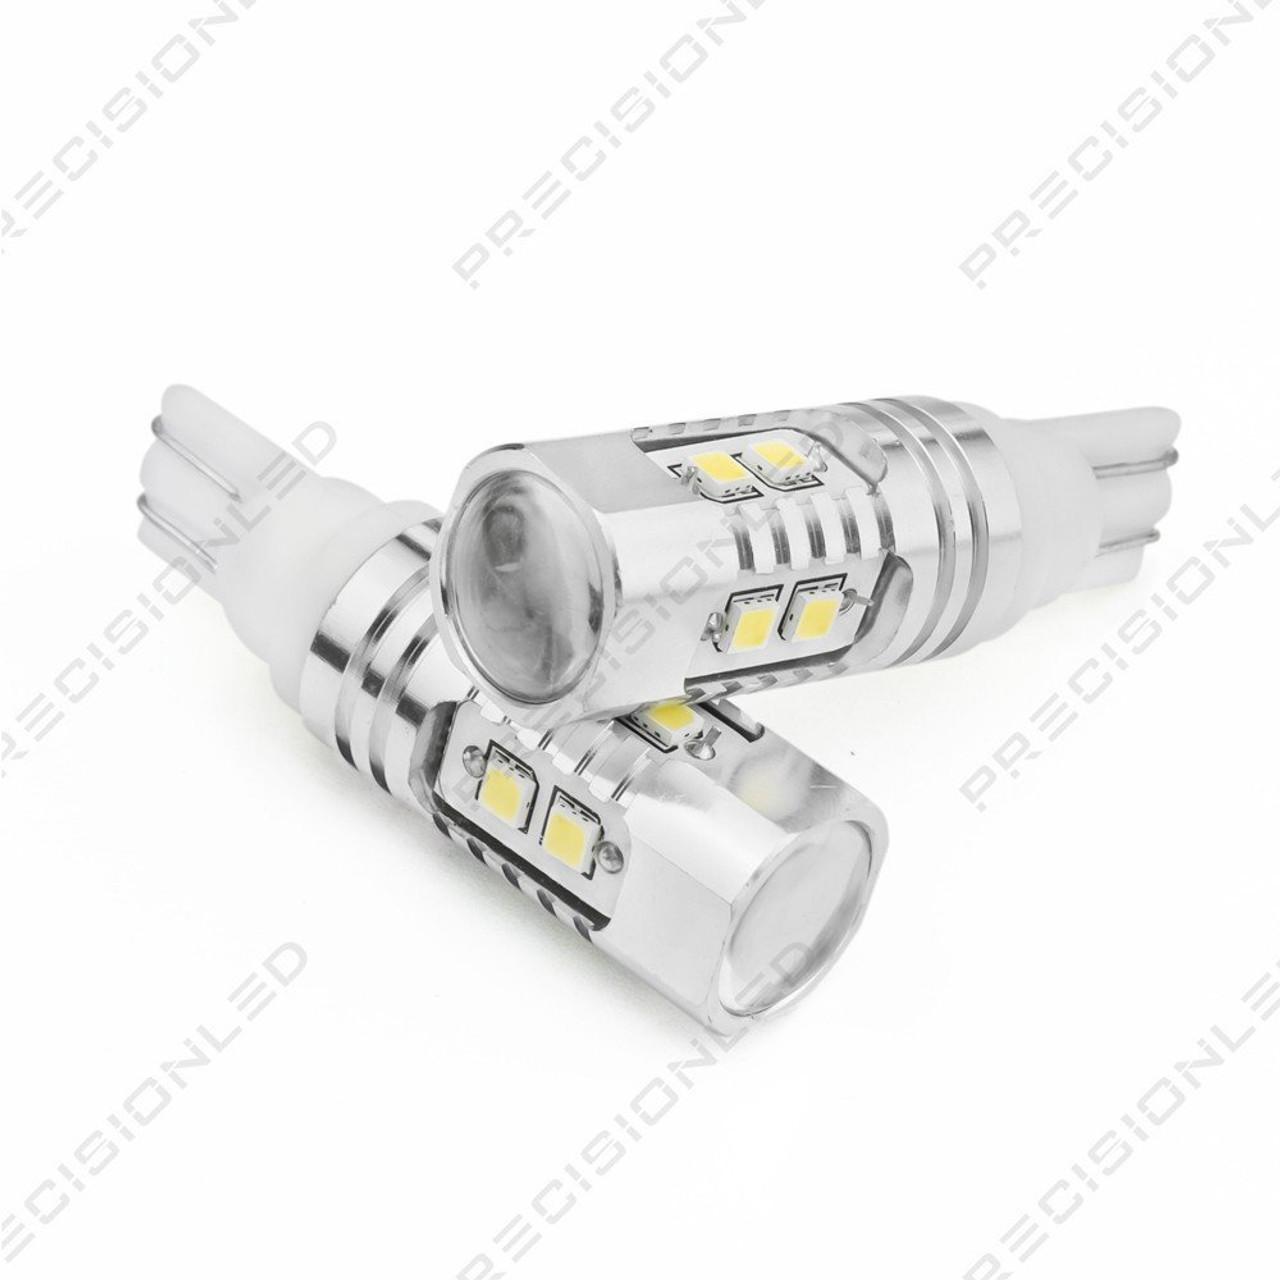 Jeep Patriot LED Backup Reverse Lights (2007-Present)